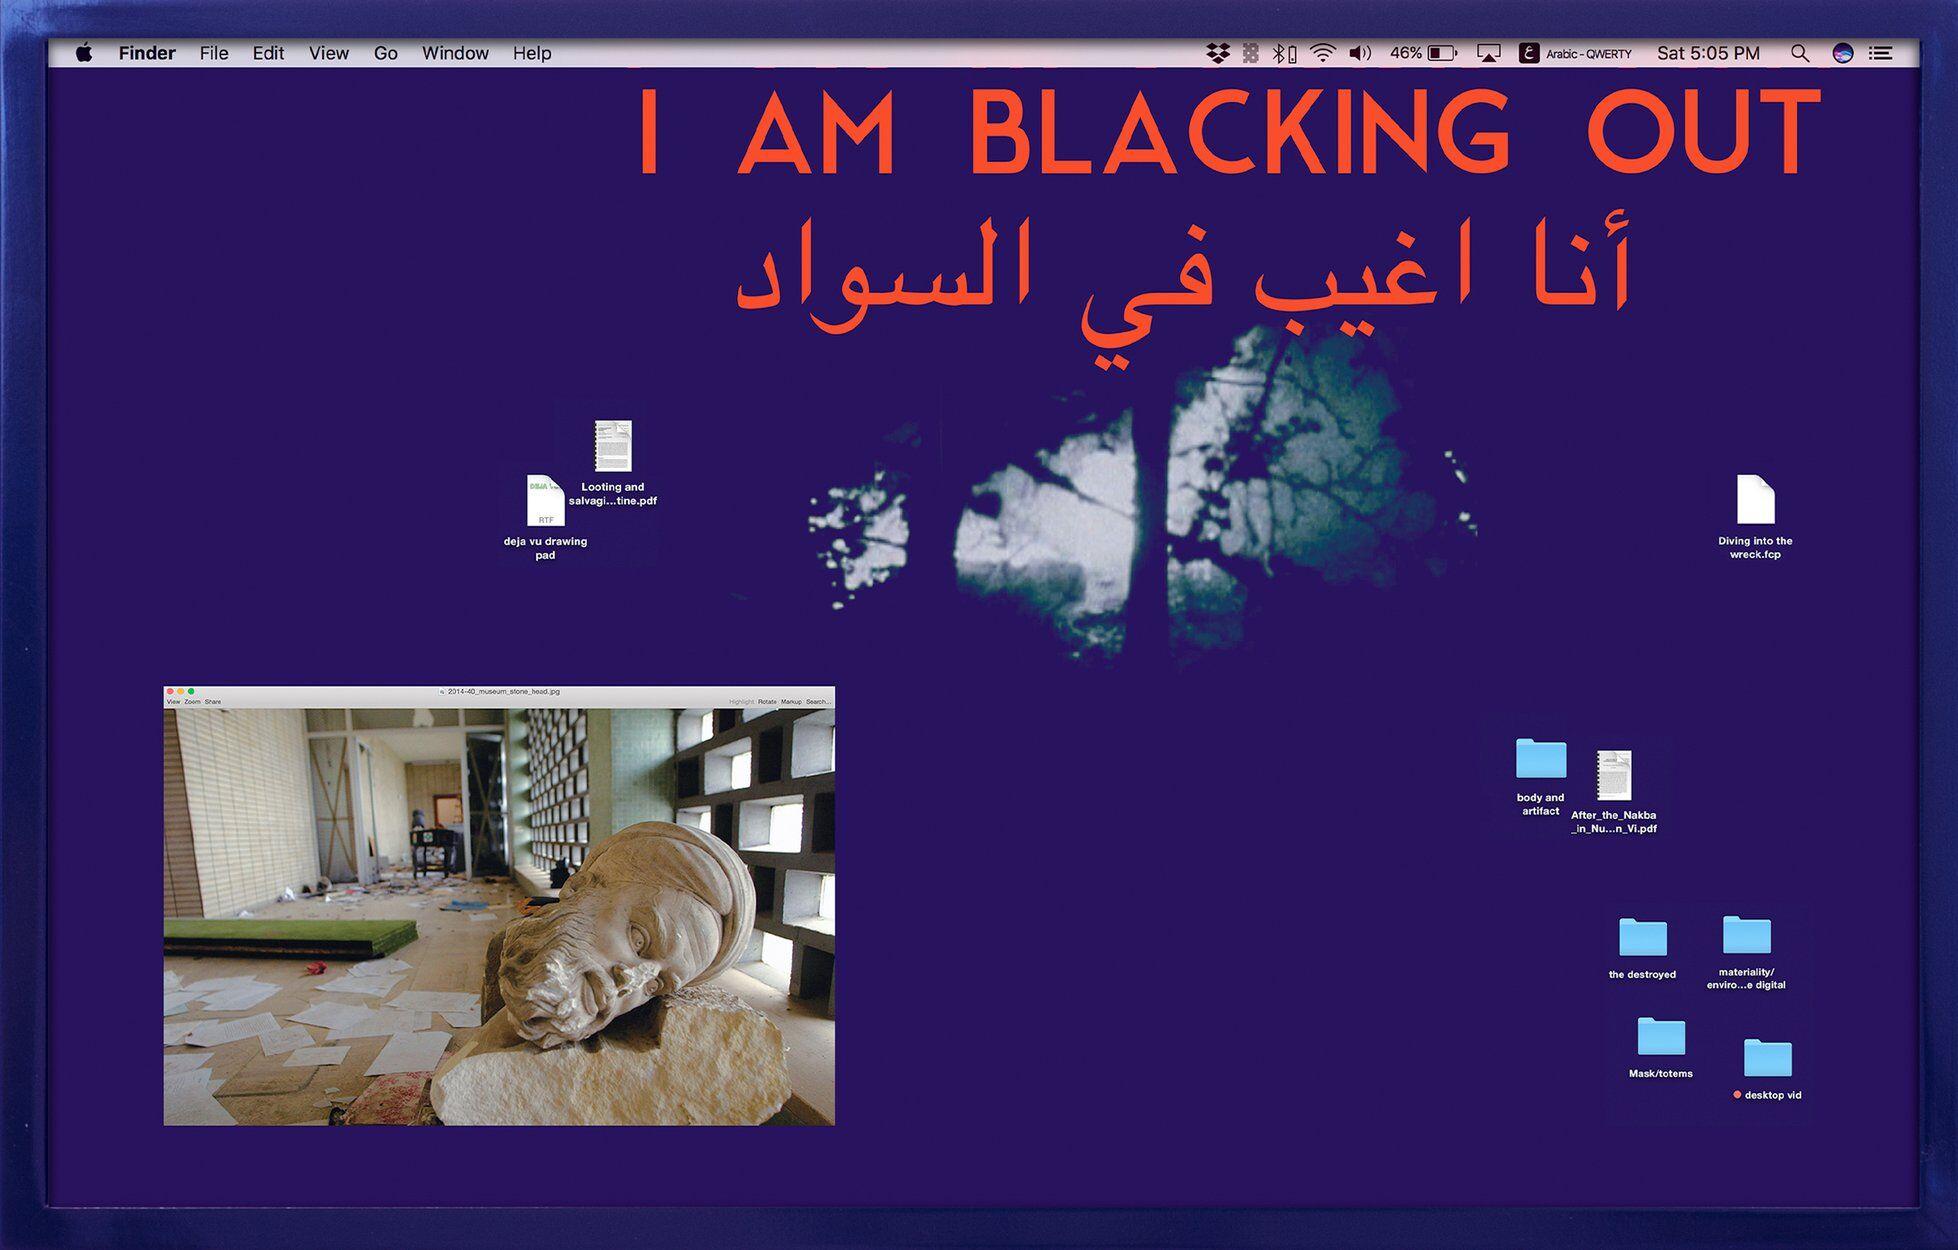 basel abbas ruanne abou rahme screenshot 2017 03 18 17 05 53